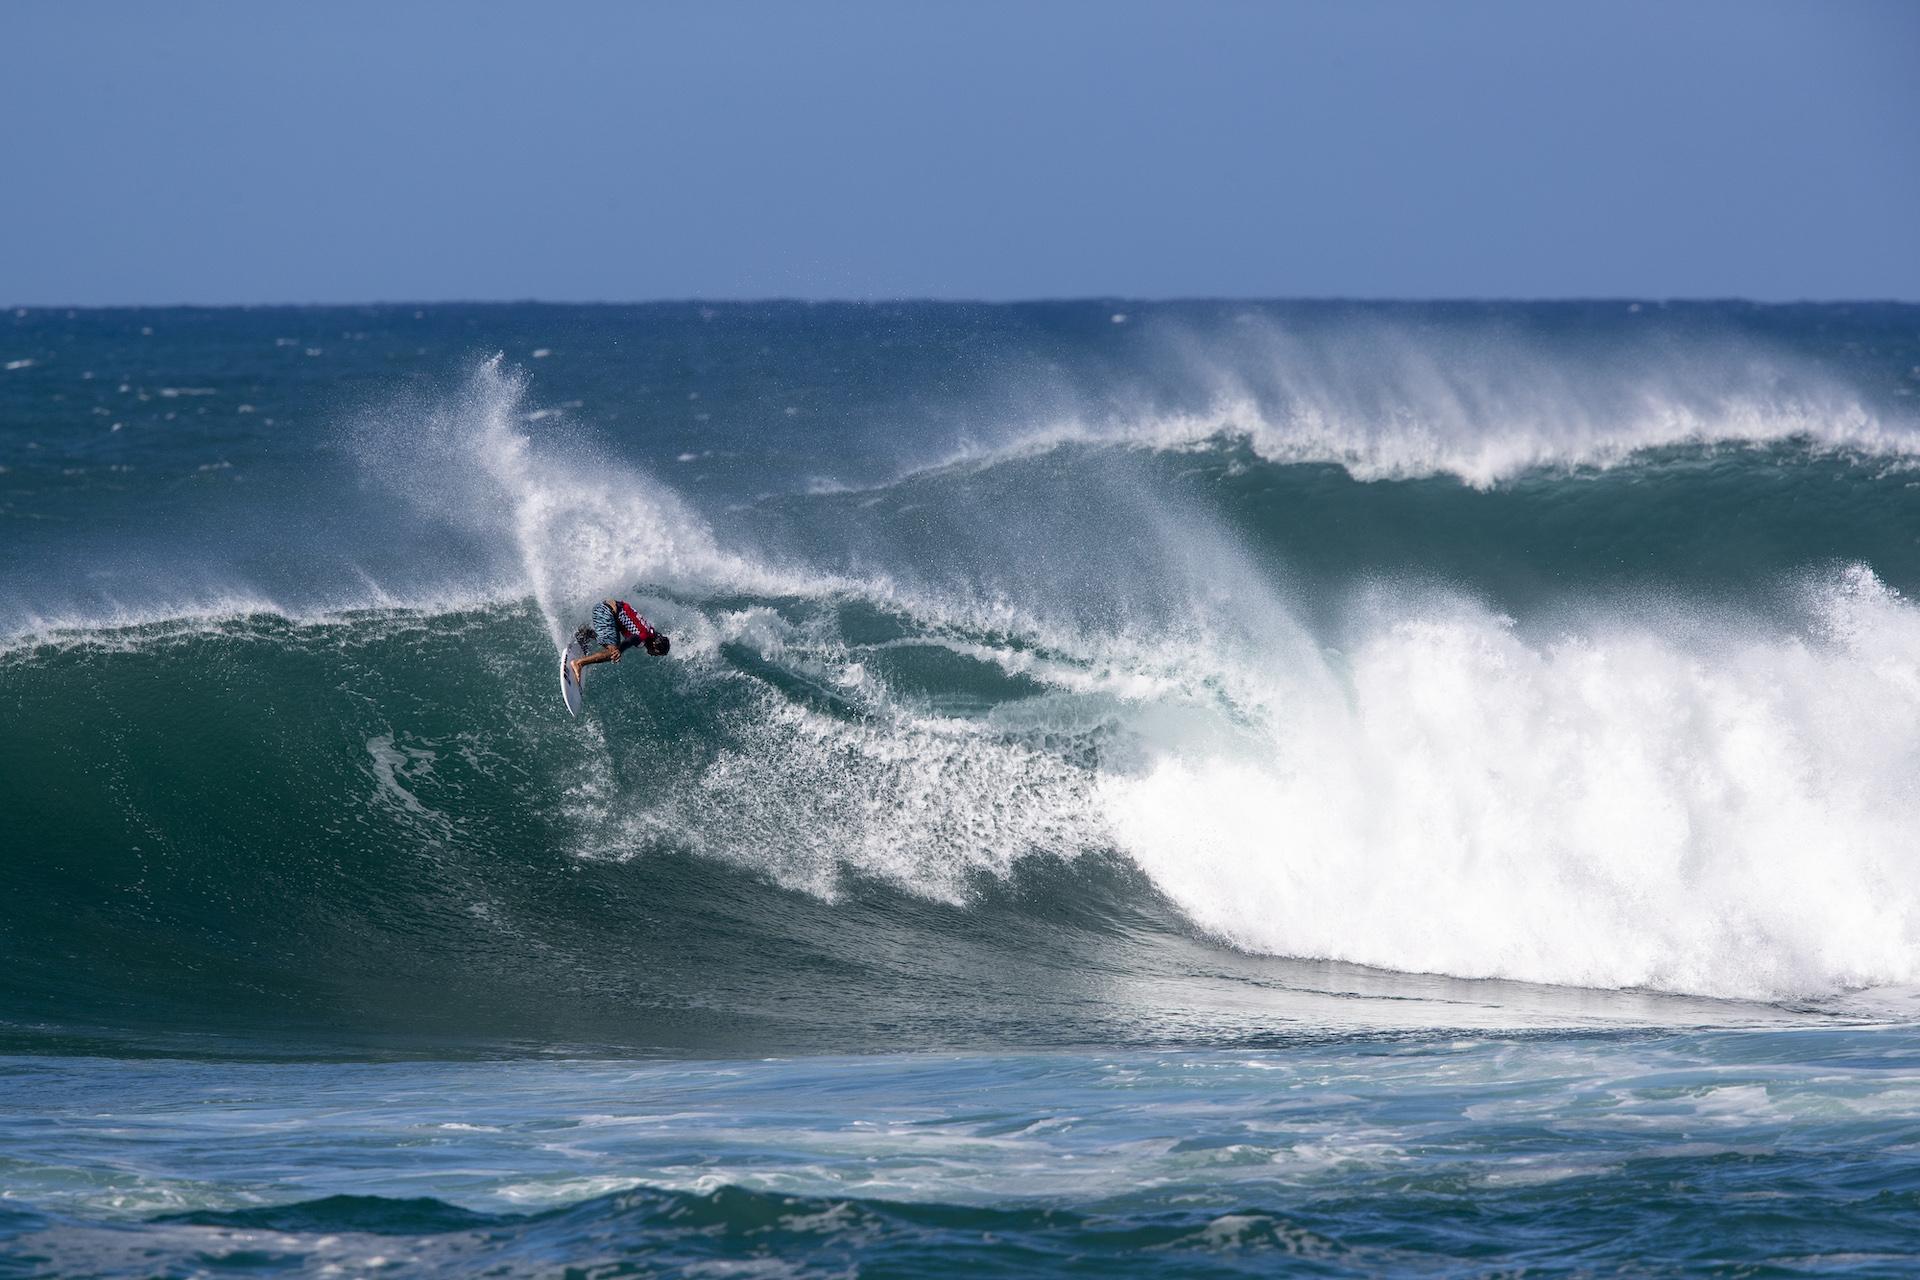 de6b91214eabfd Should  QS Season End at Haleiwa Instead  - Surfline